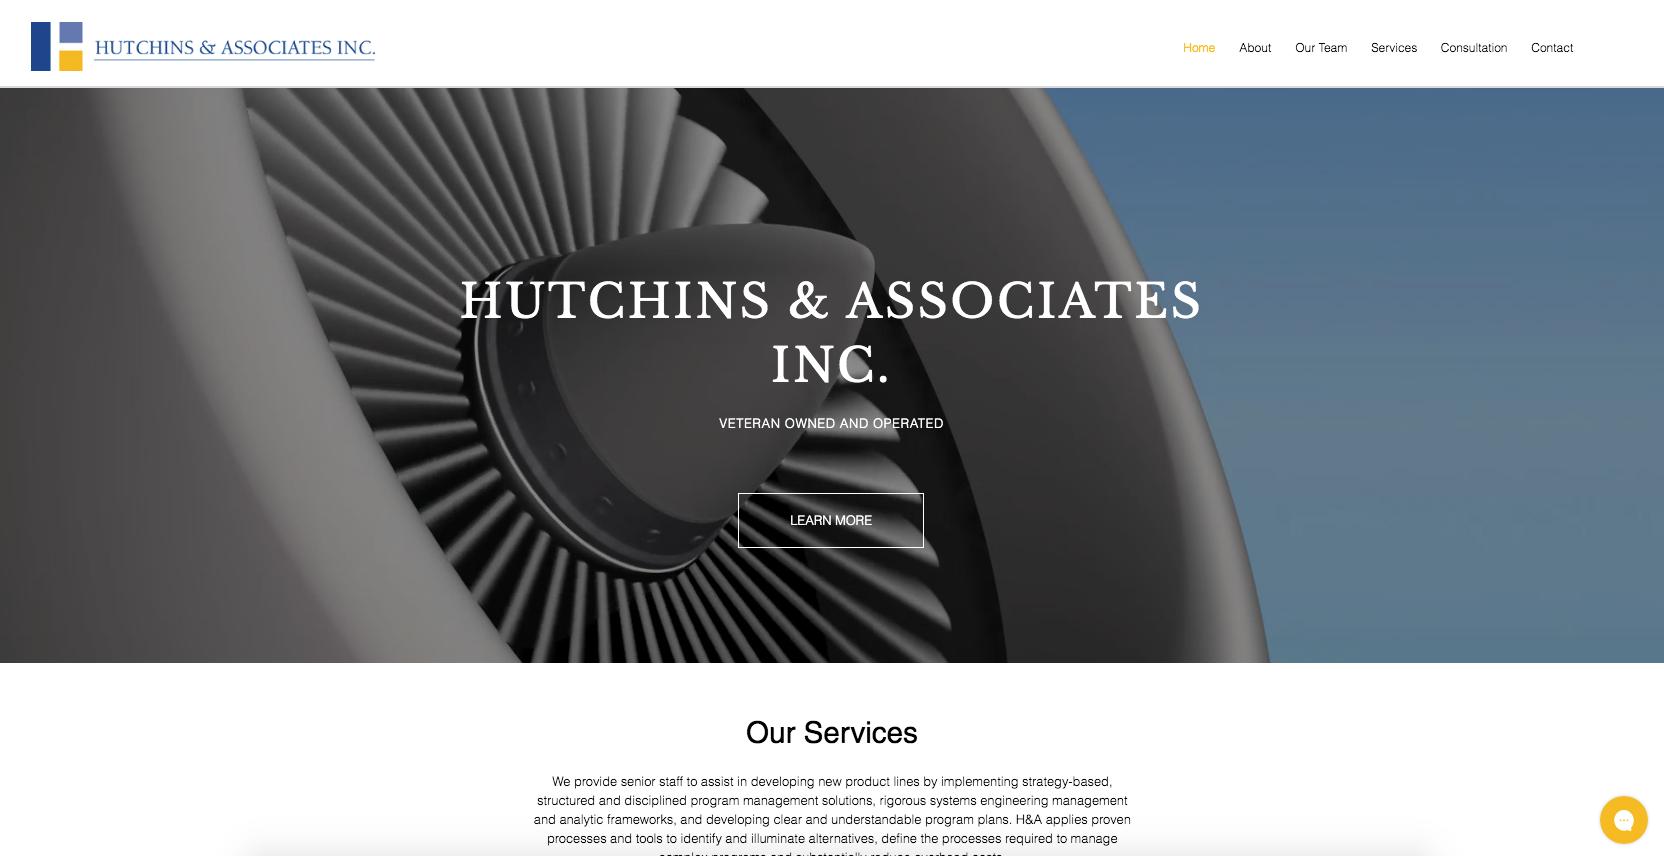 Hutchins & Associates INC. We provide senior staff to assist in developing ne...